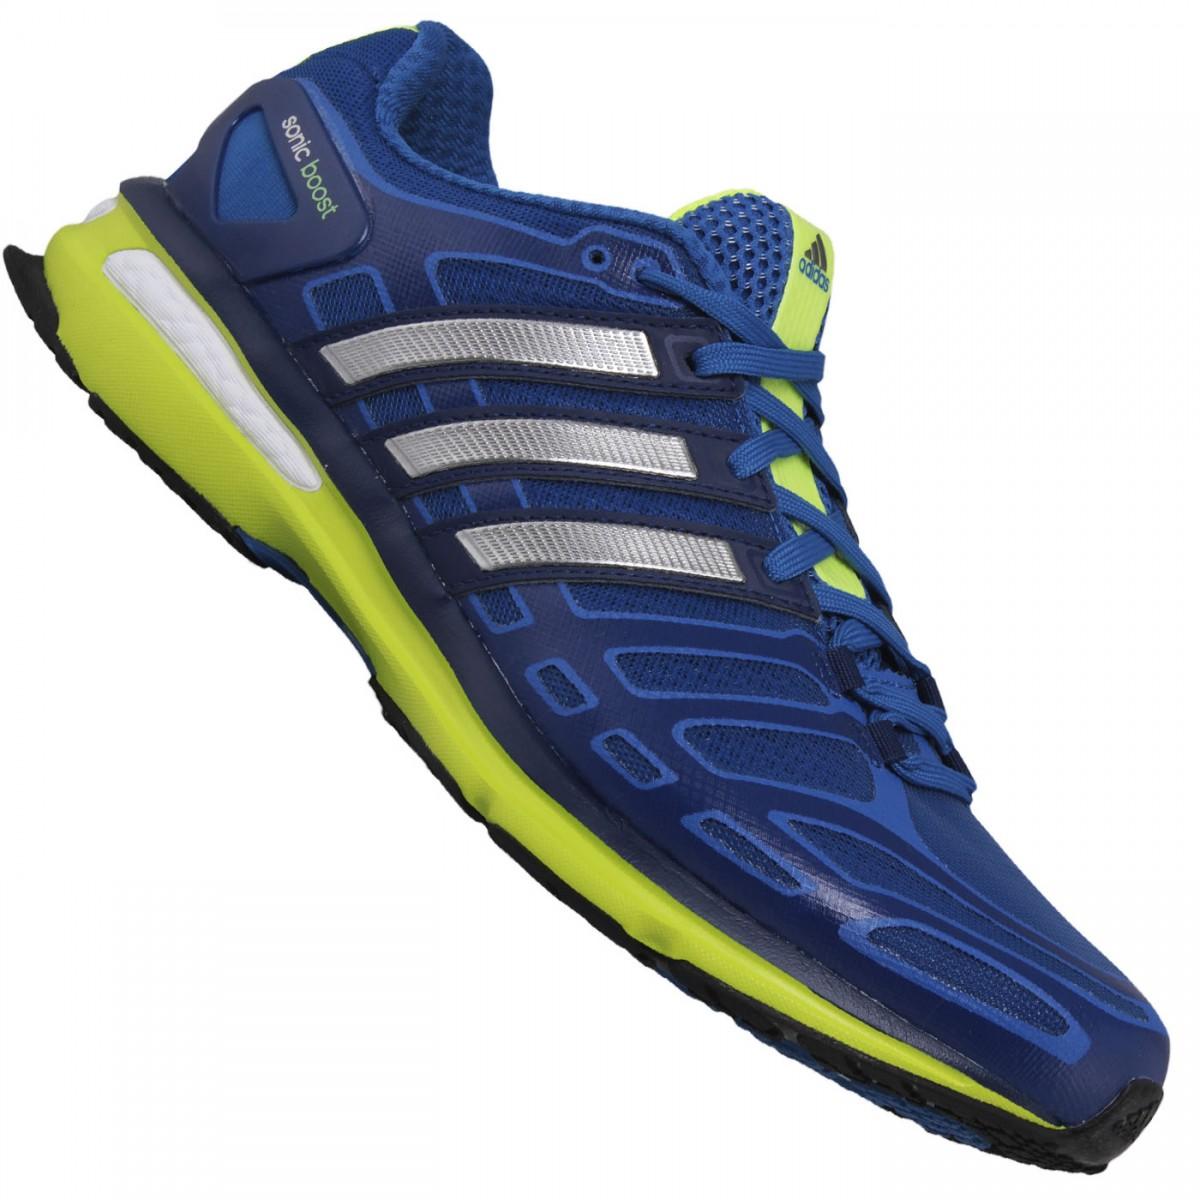 6f5d646821d31 Tênis Adidas Sonic Boost